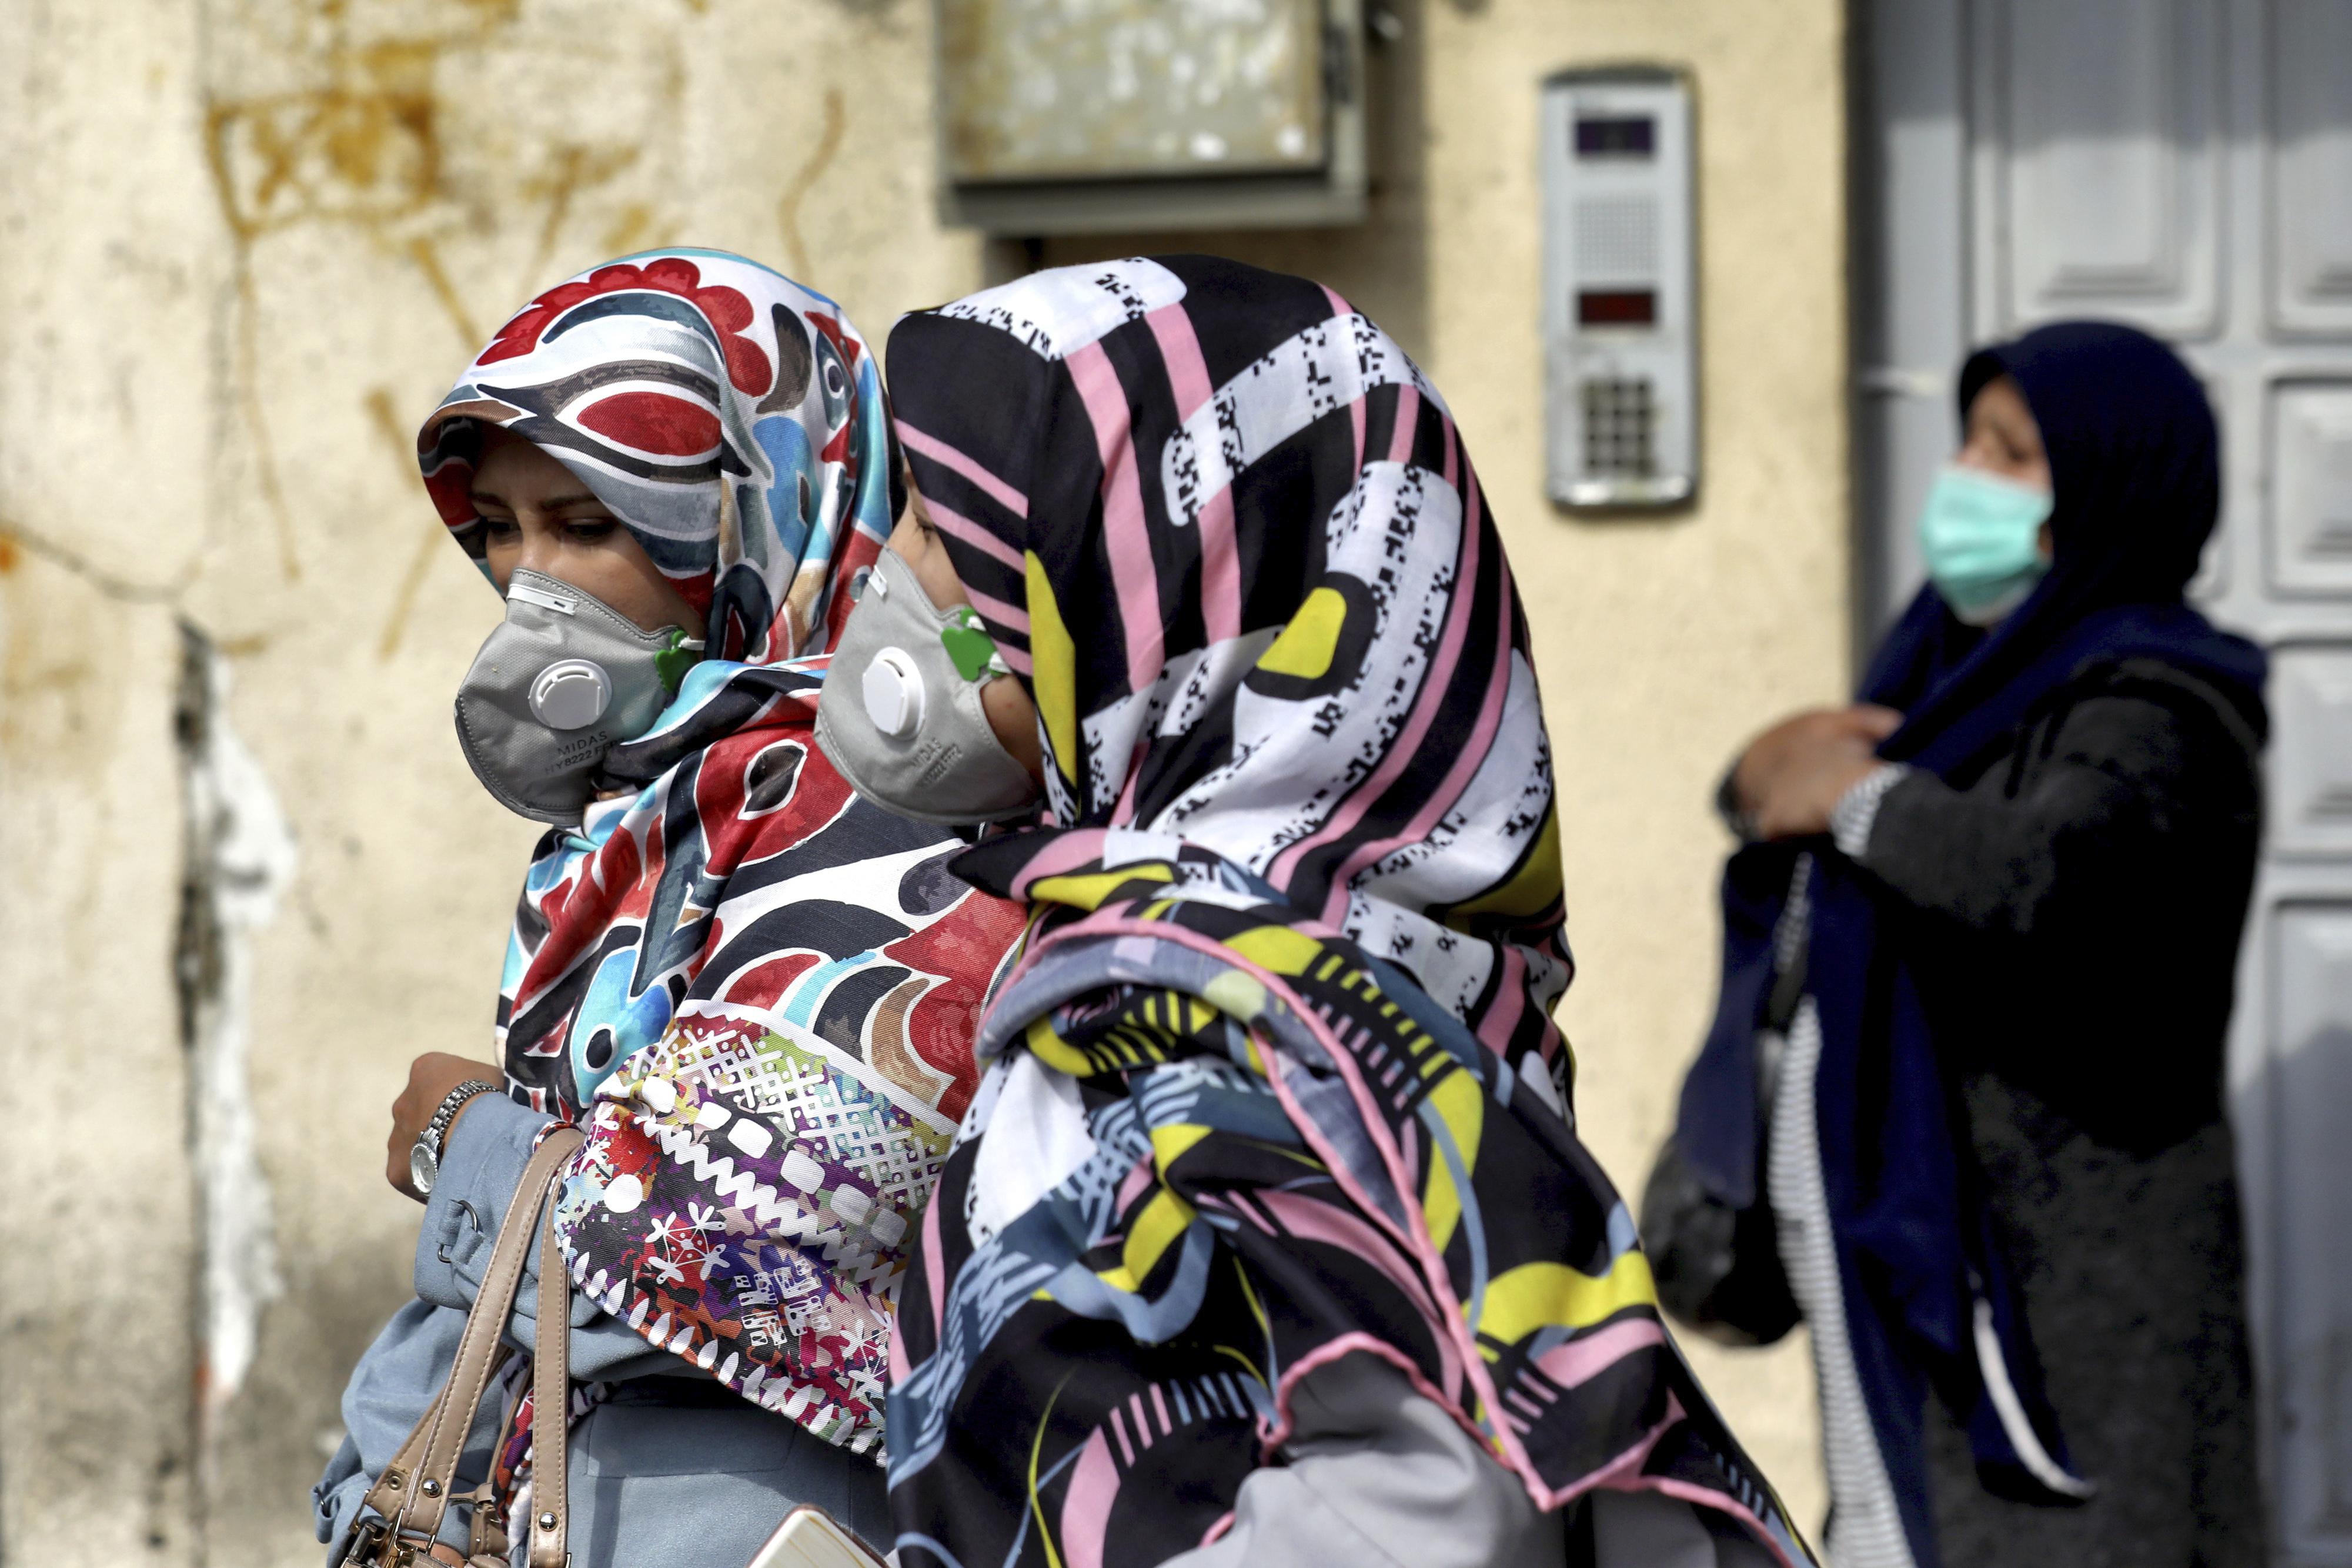 People wear masks to help guard against the Coronavirus in downtown Tehran, Iran, on Feb. 23, 2020.